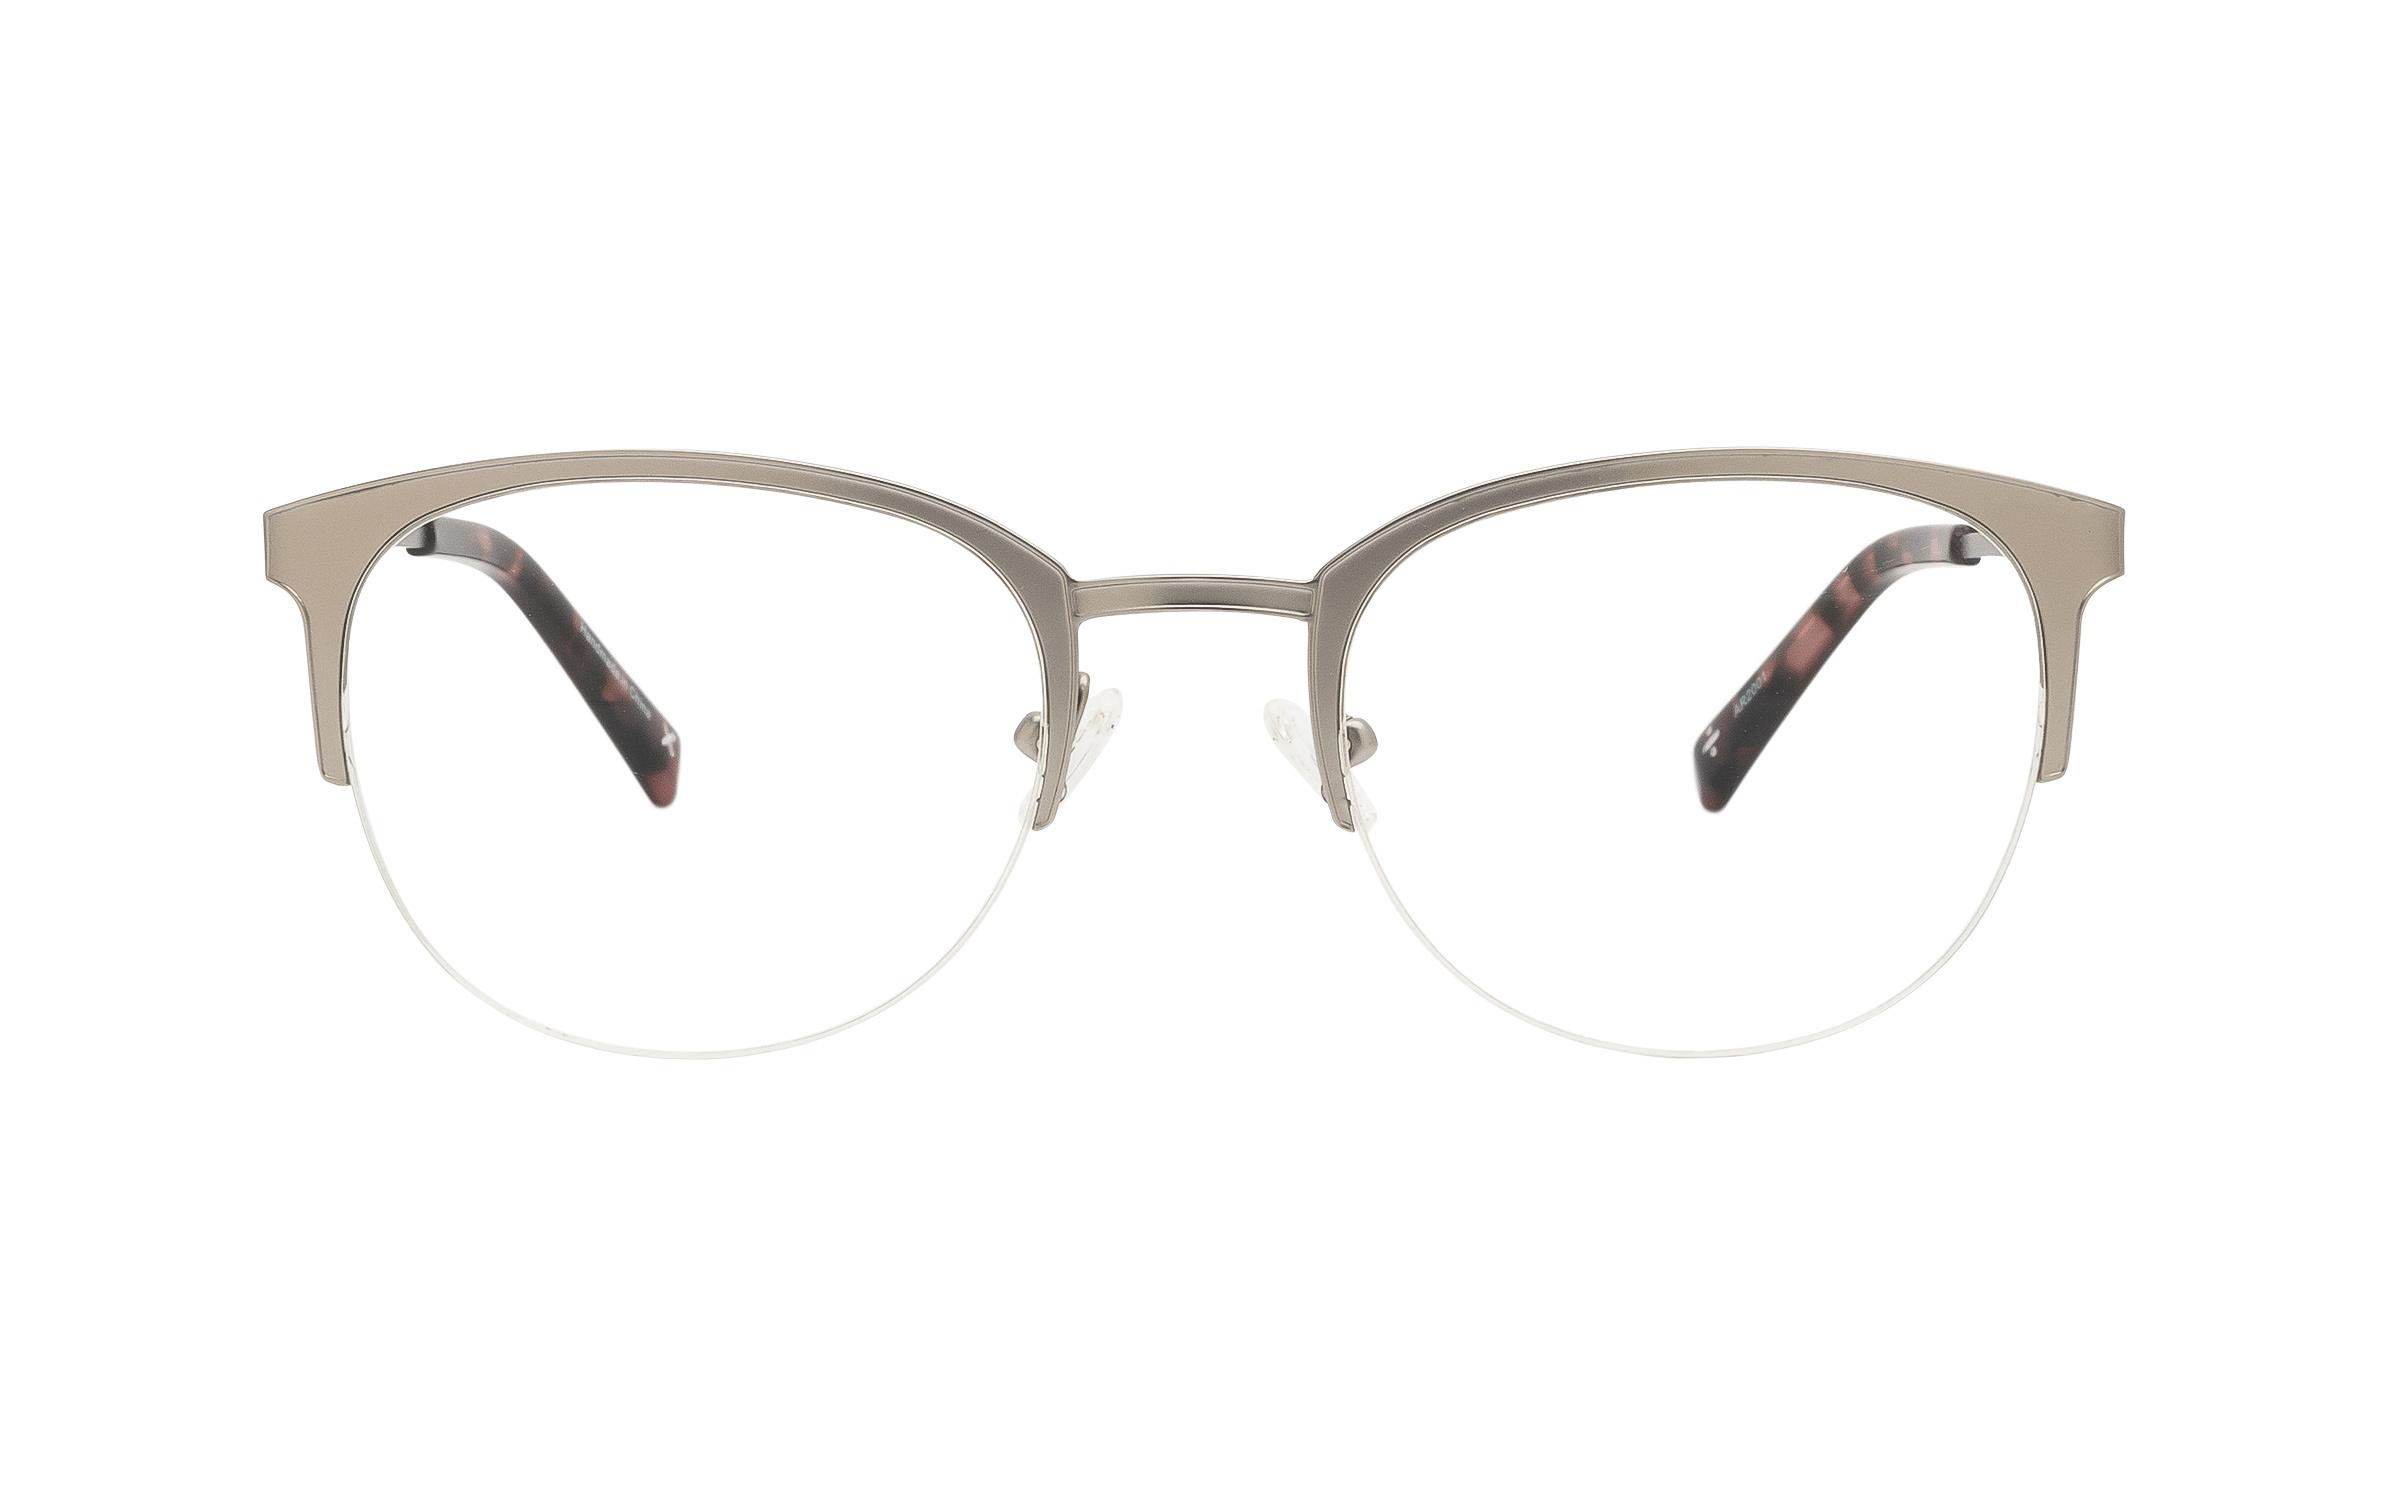 coastal.com - Derek Cardigan Helike TIT010 C01 (51) Eyeglasses and Frame in Silver | Plastic – Online Coastal 65.00 USD